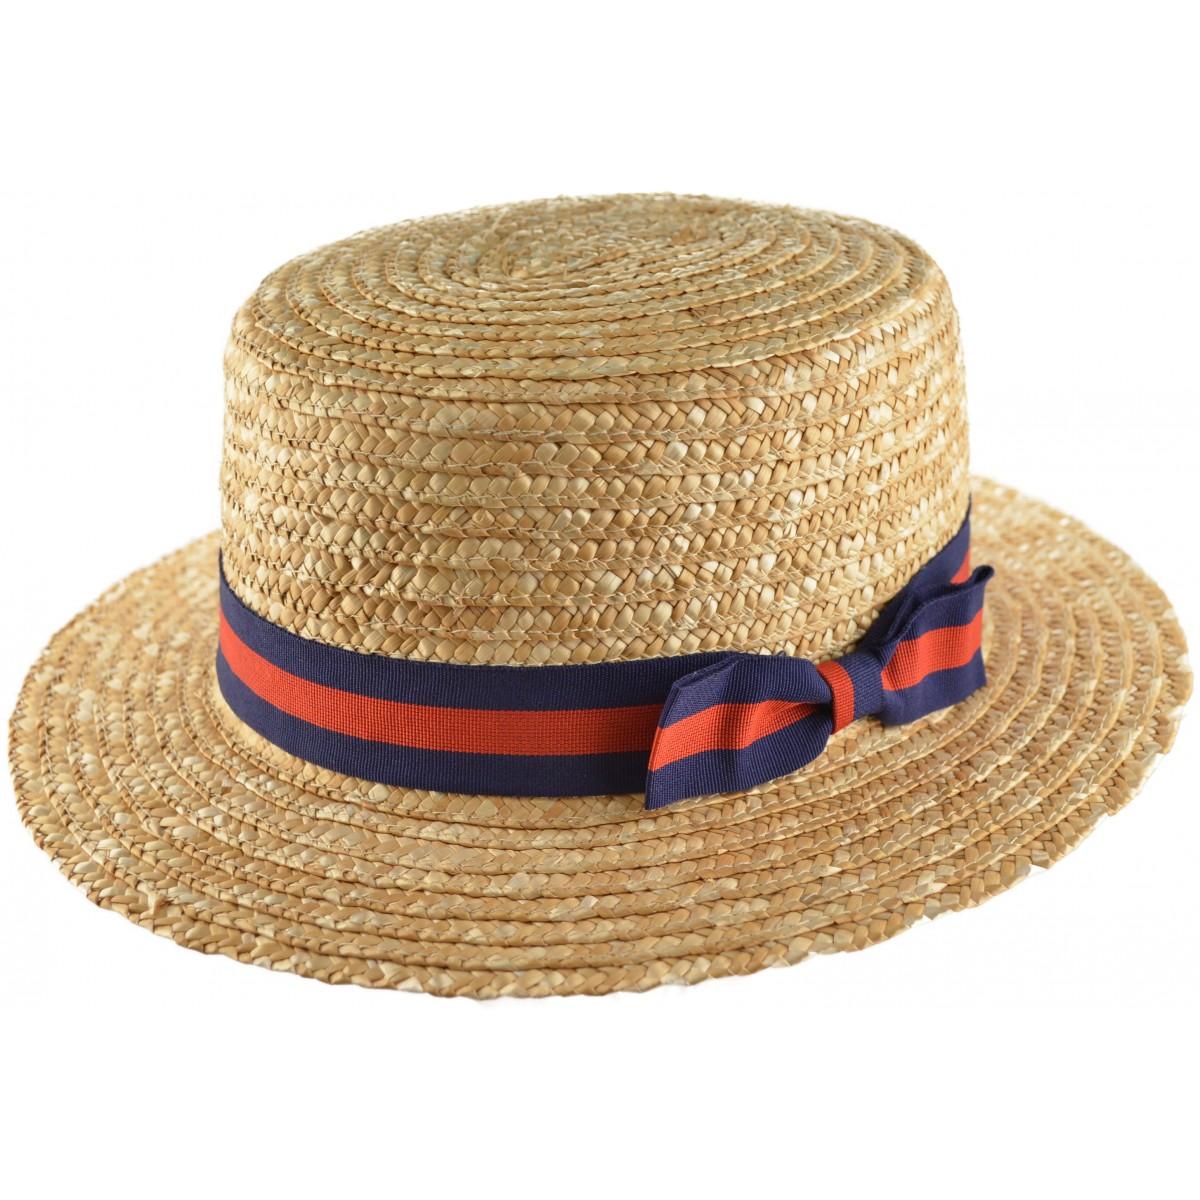 New Stripe Trim Straw Summer Boater Hat 1920 s 30 s 40 s Vintage ... 8dbc3cca9f45